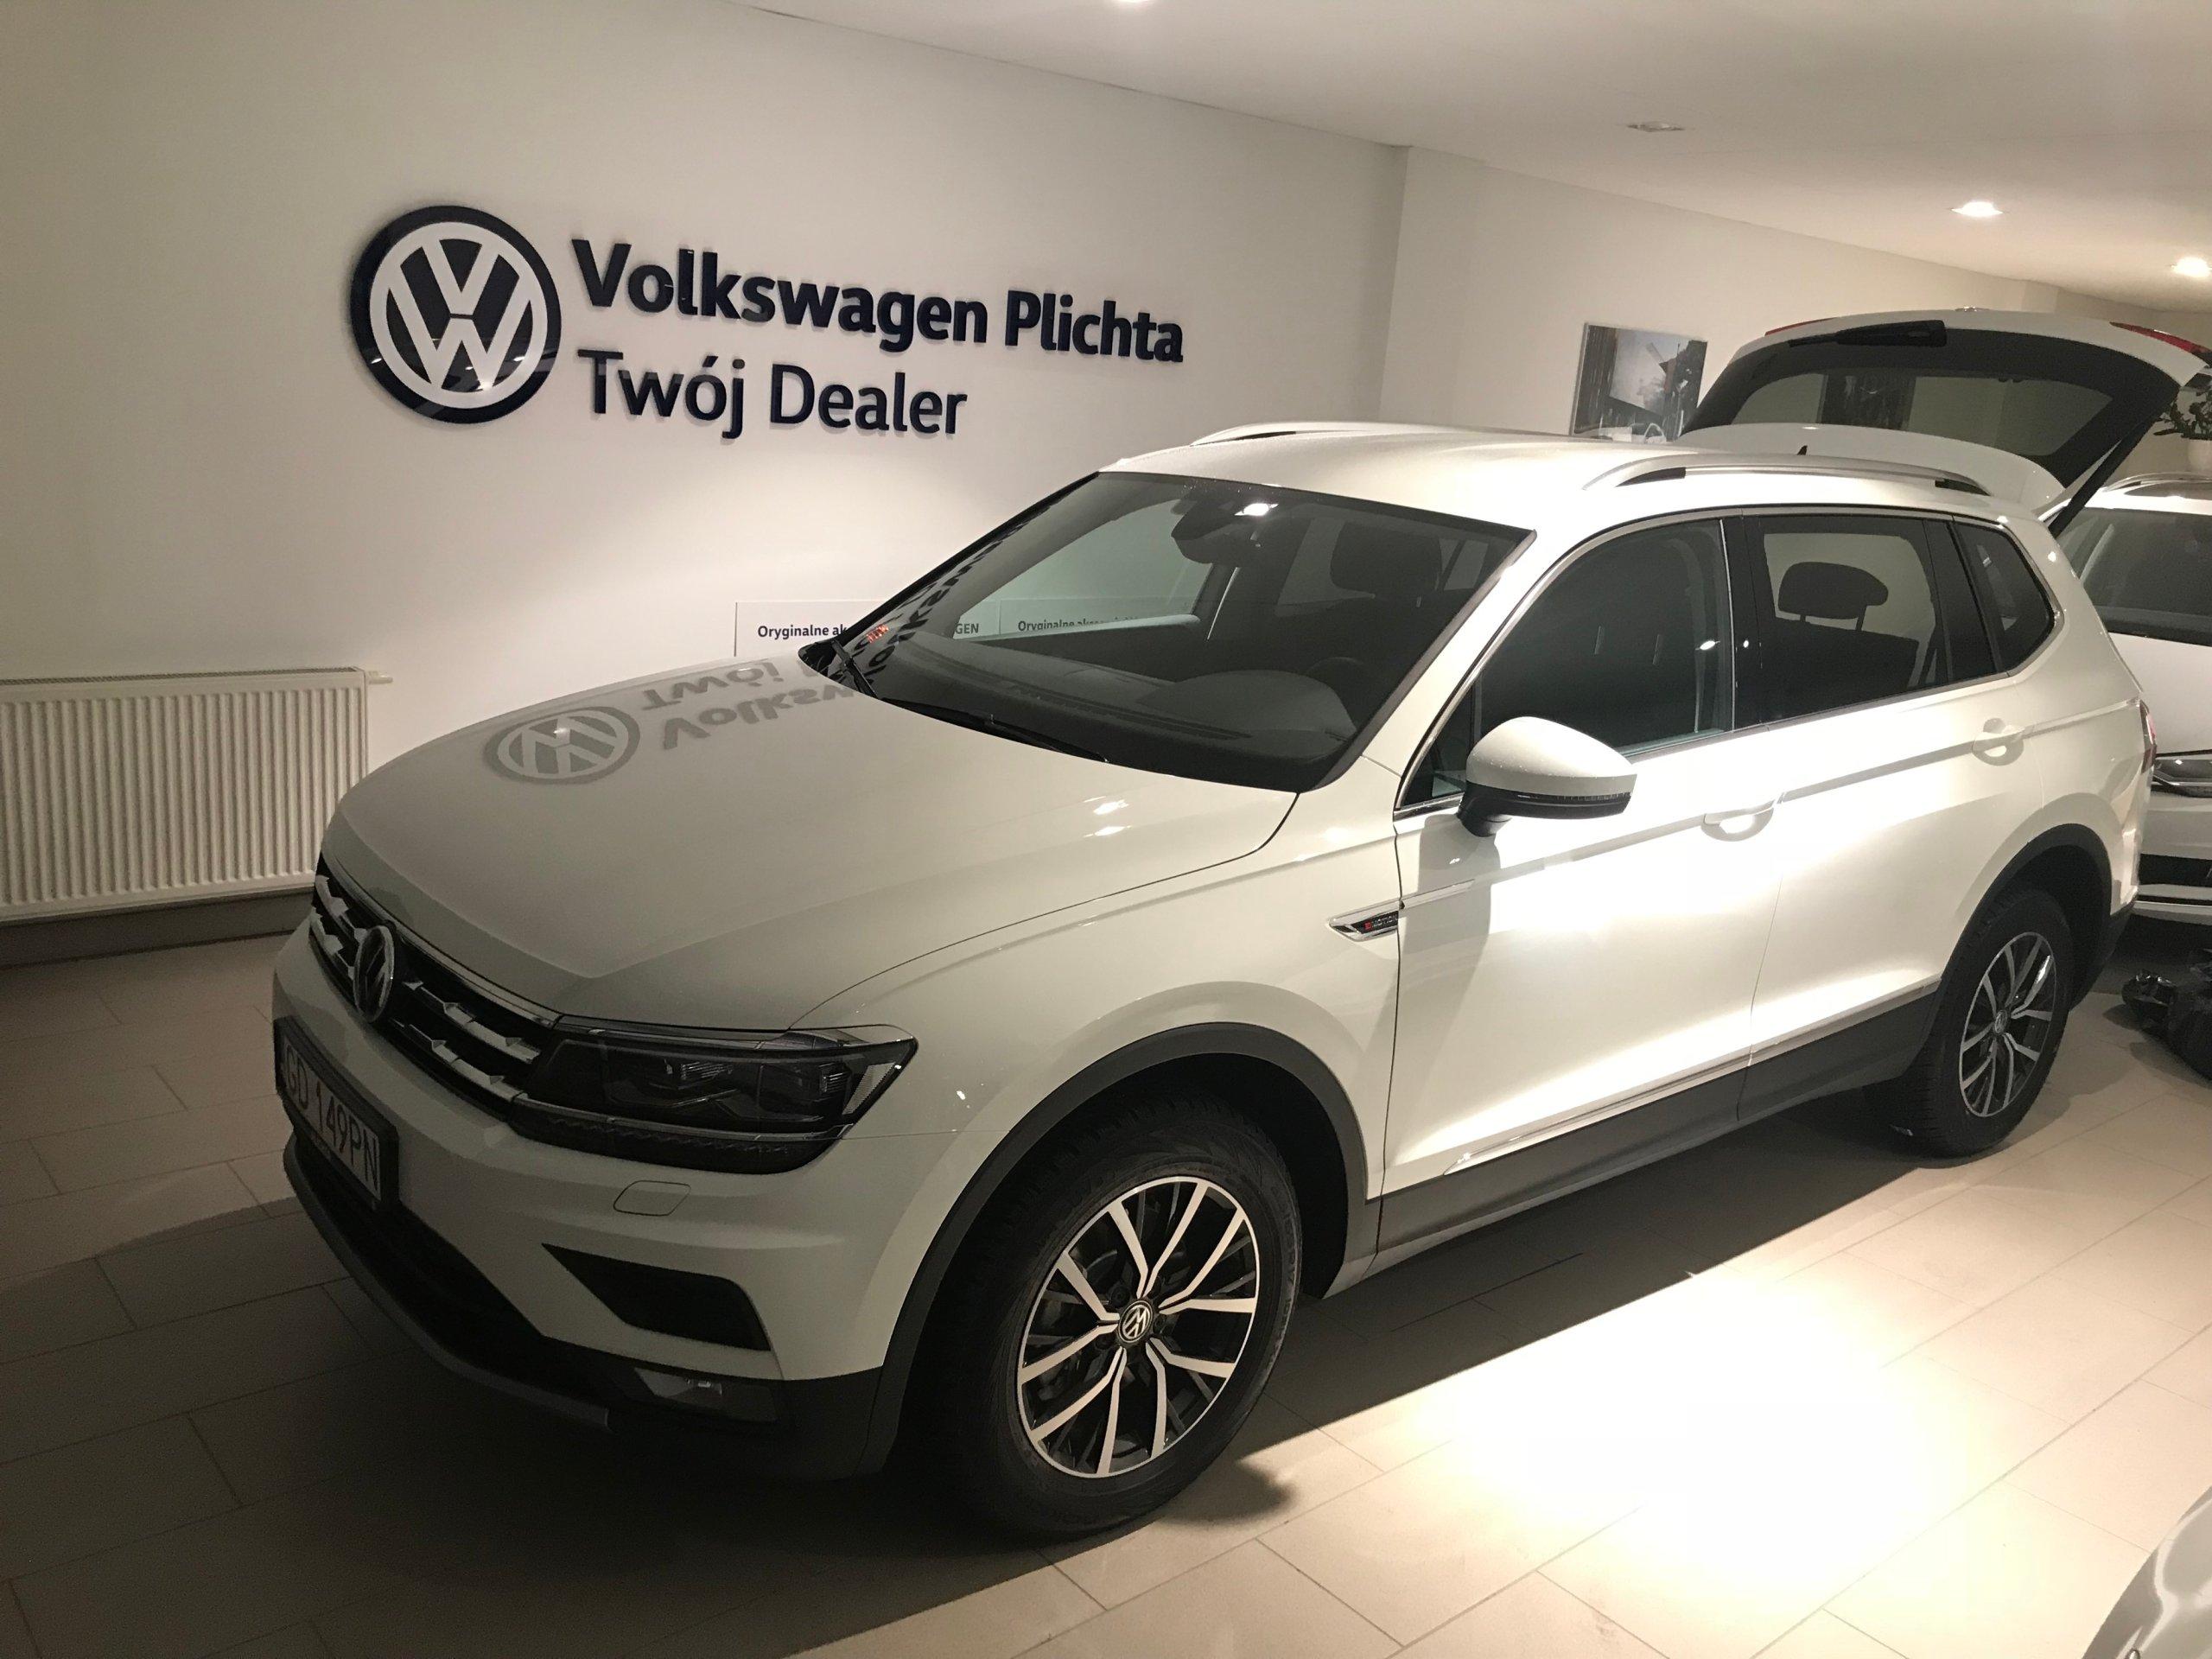 VW TIGUAN 2017 2.0 TDI 4MOTION wynajem bez BIK/BIG